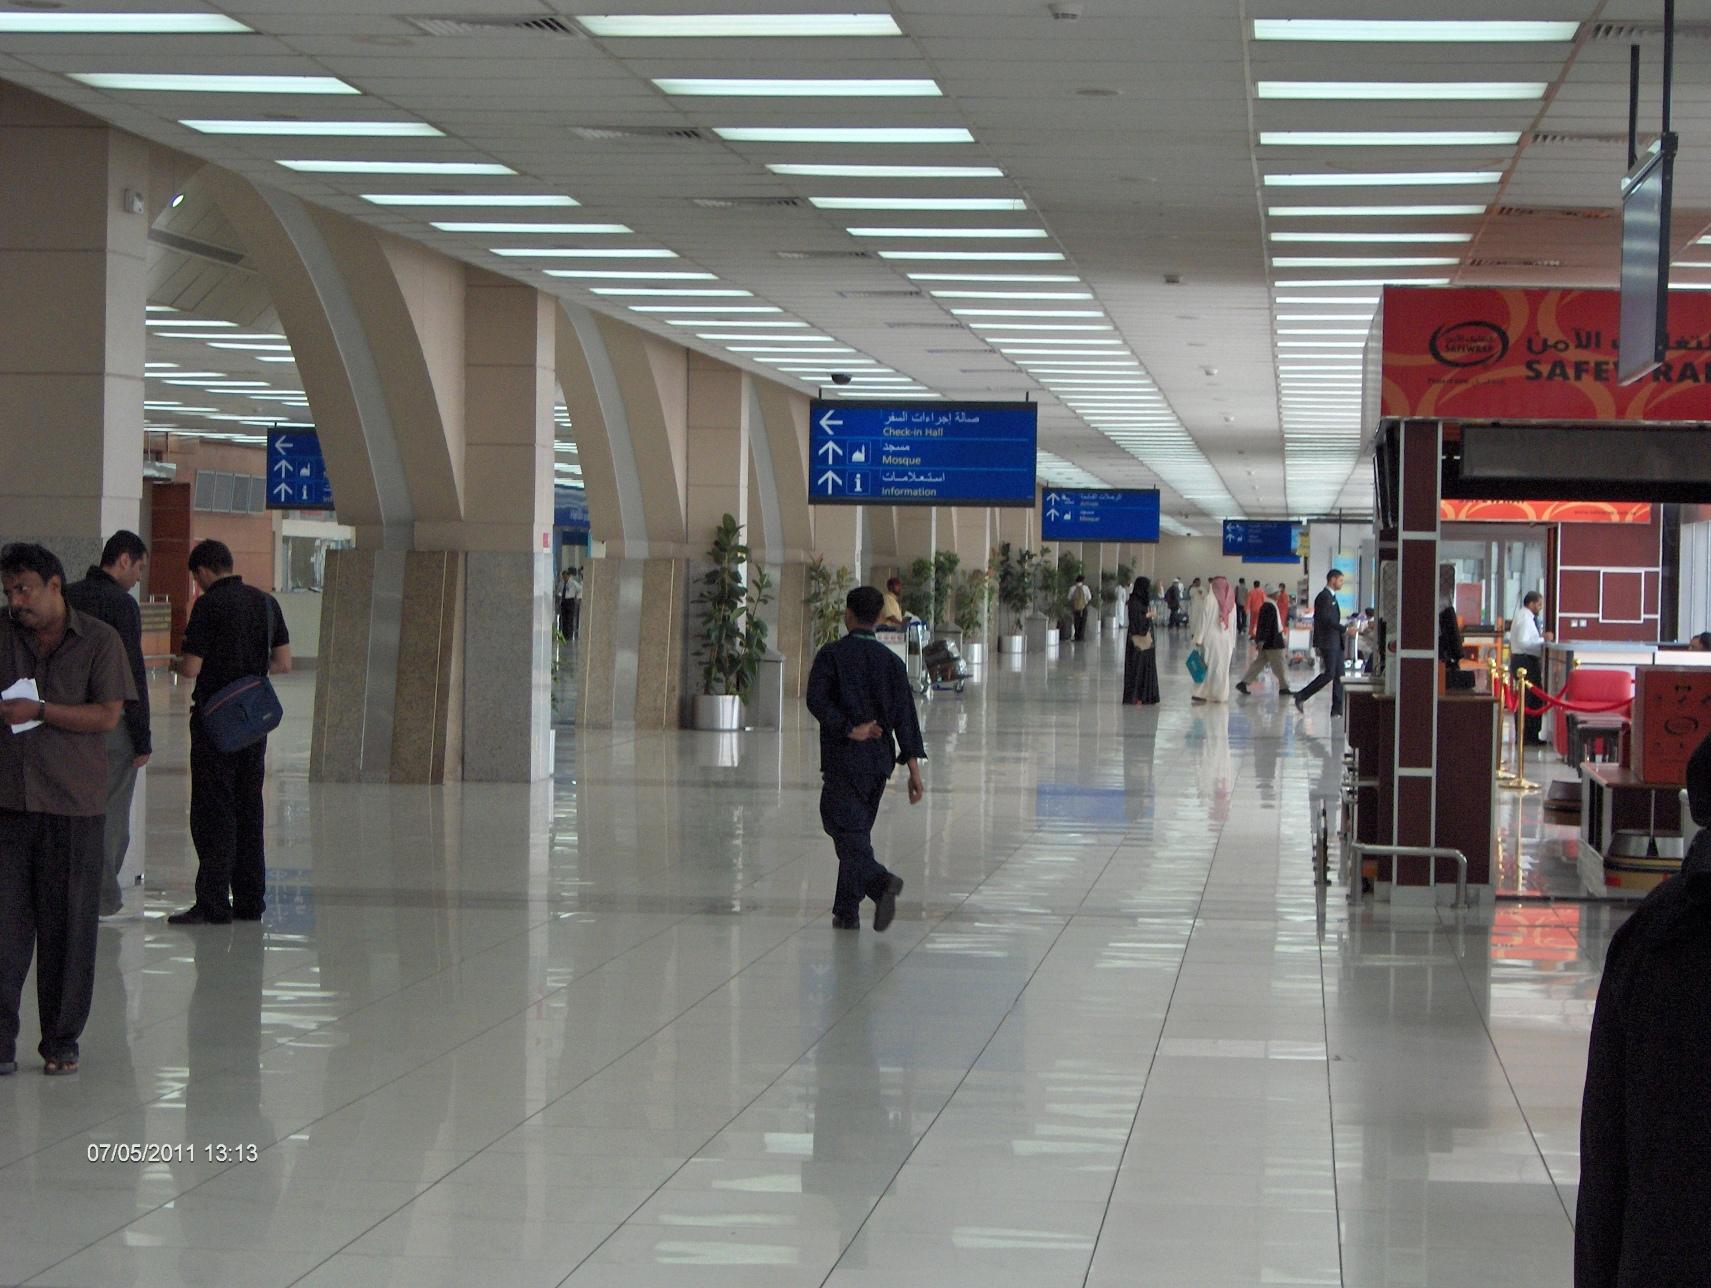 Cidde_Havalimanı_Jeddah_Airport_May 2011_002